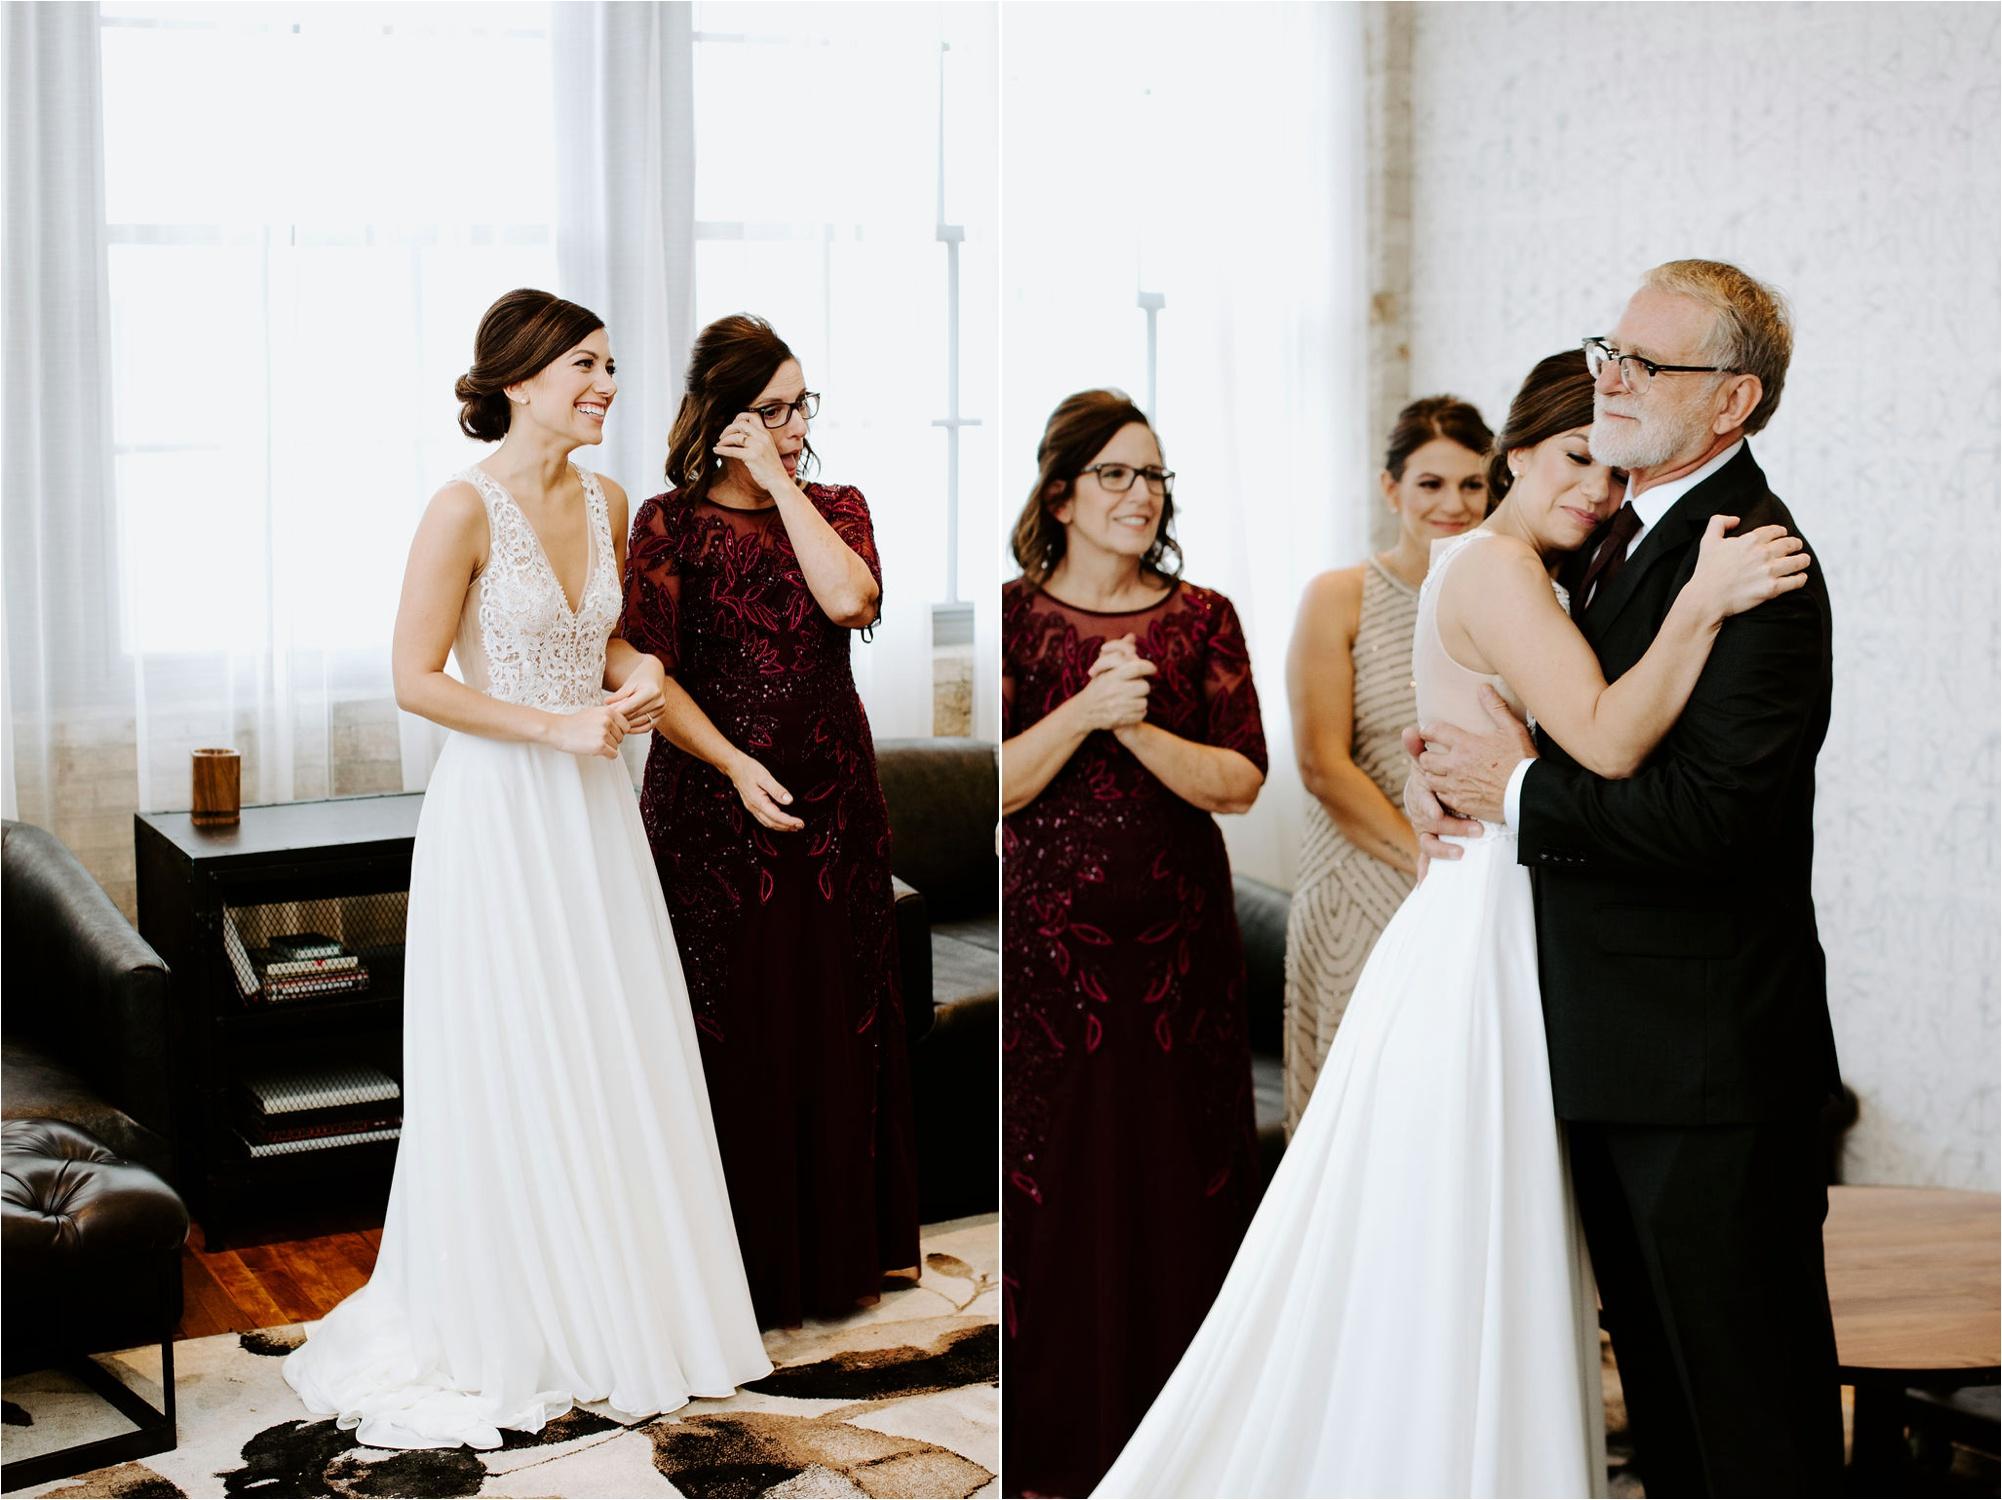 machine shop minneapolis wedding getting ready space, minnesota wedding engagement photography